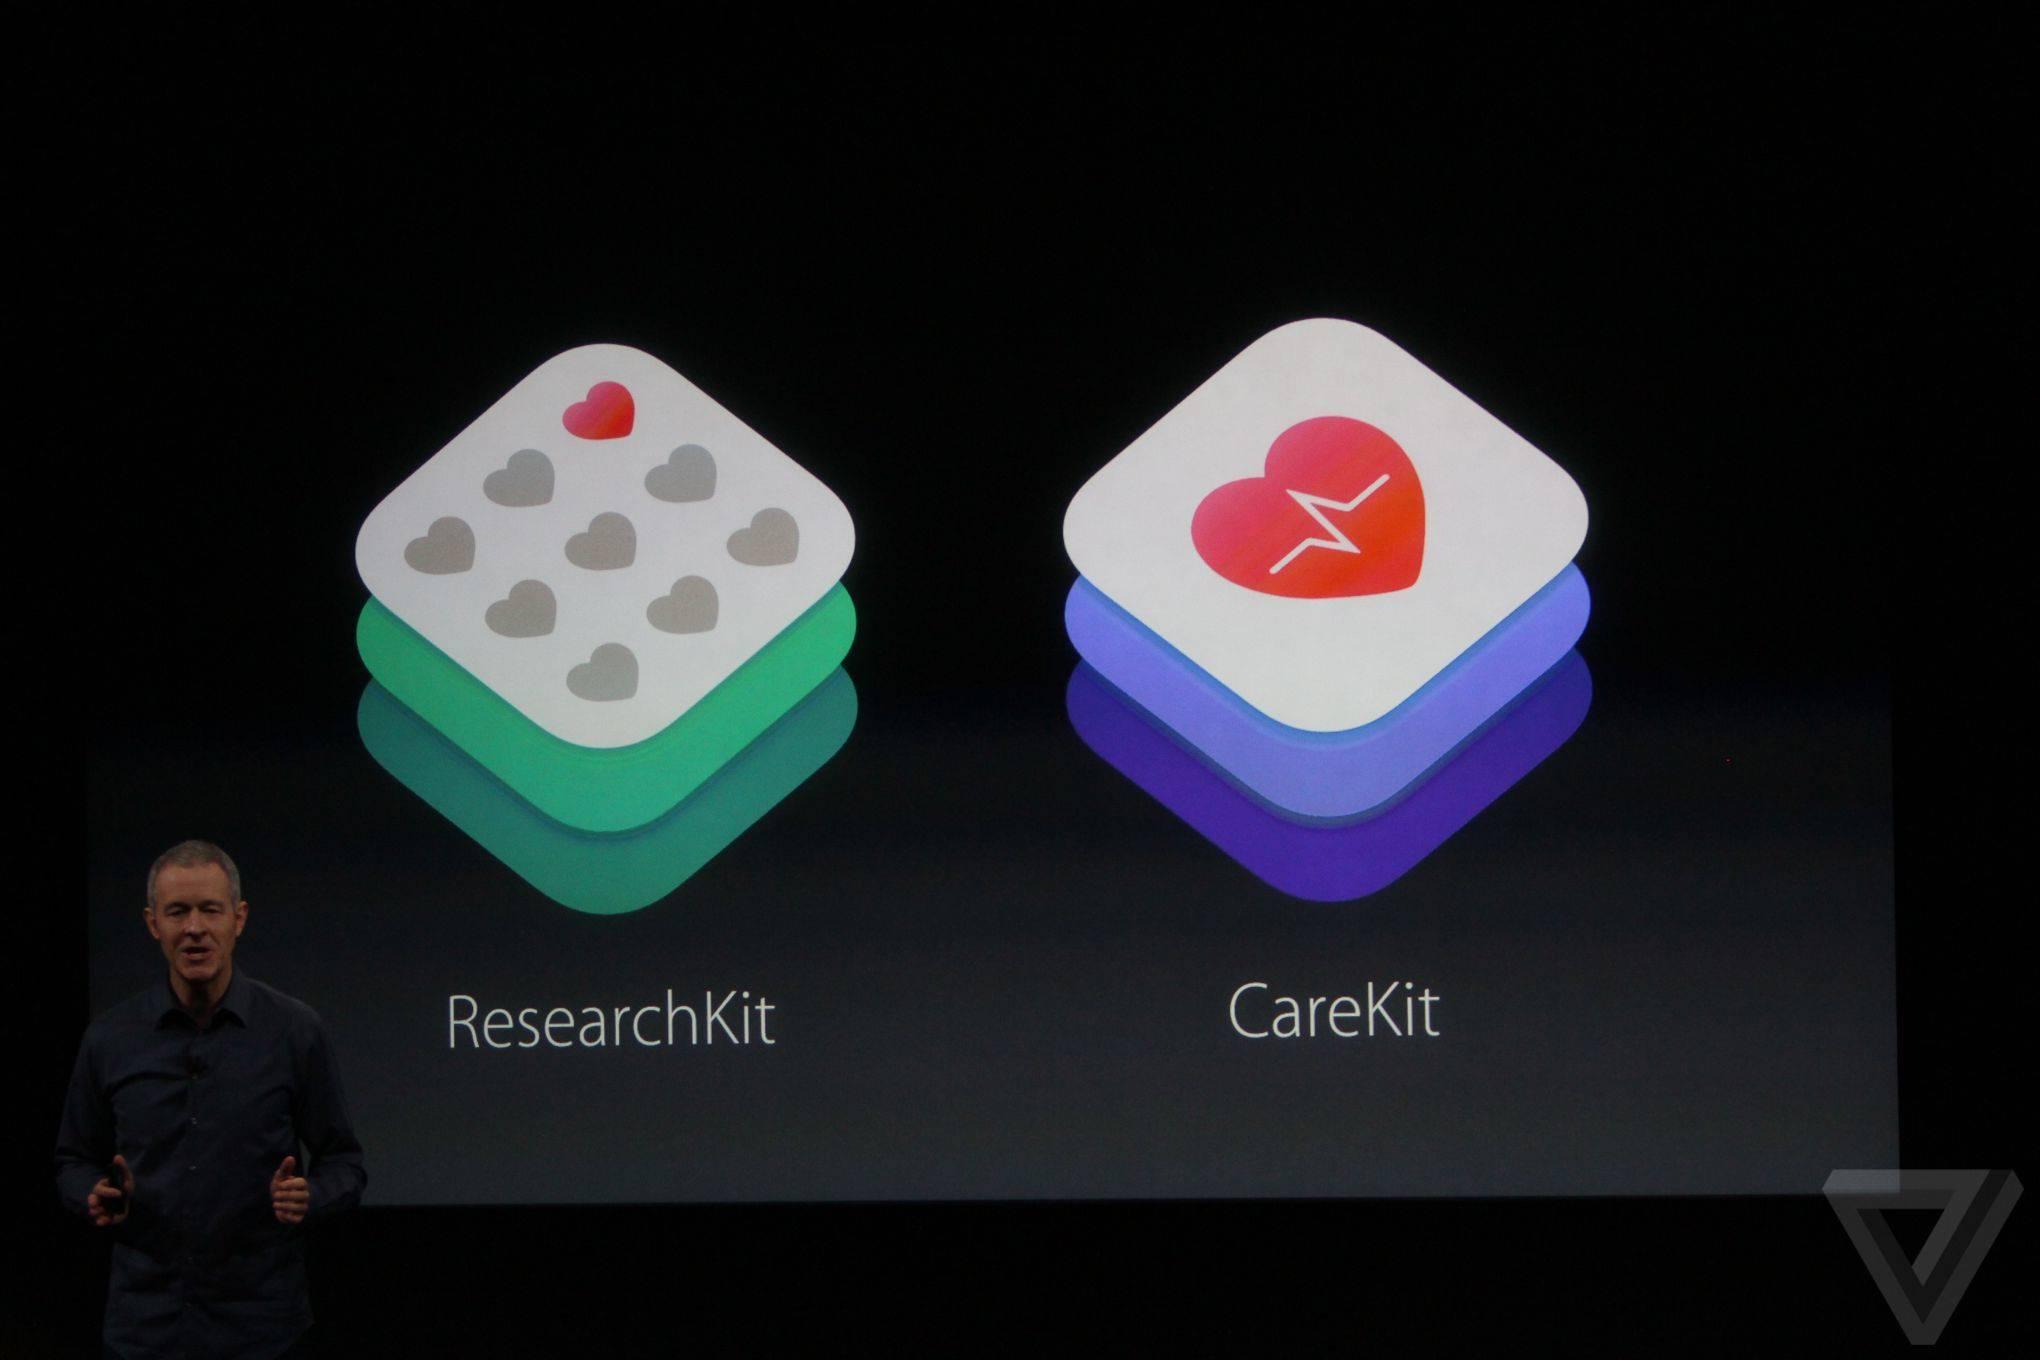 apple-iphone-se-ipad-pro-event-verge-207